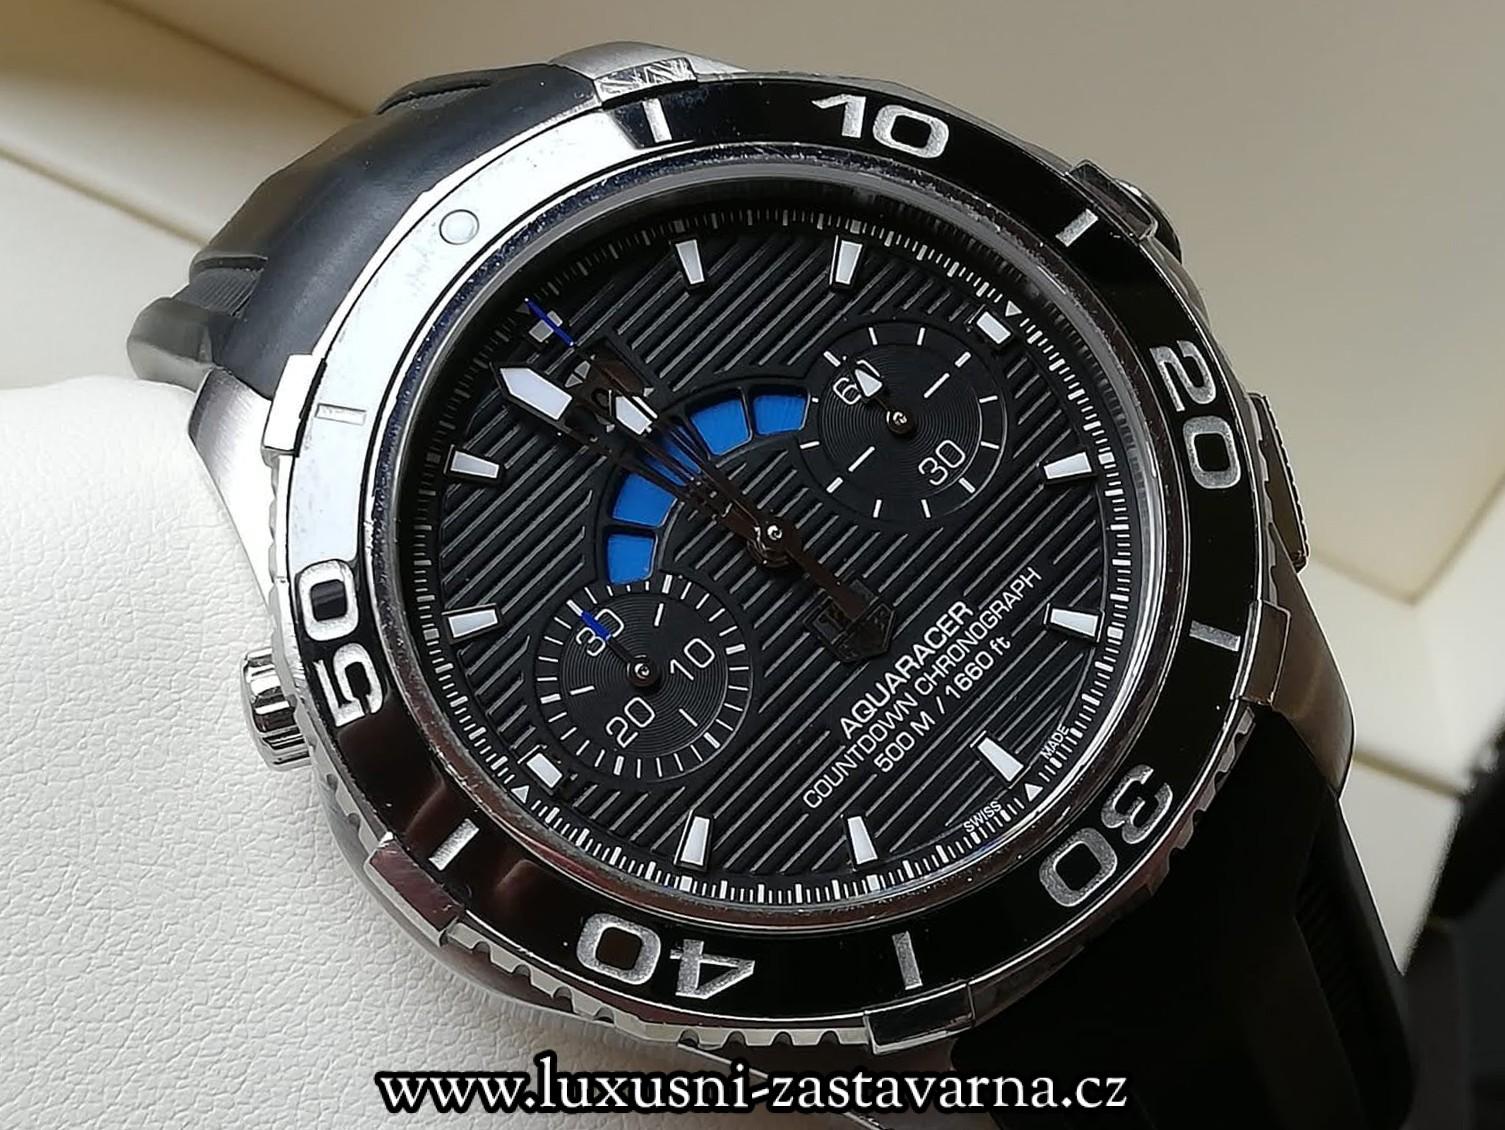 1 TAG Heuer Aquaracer 500M 1